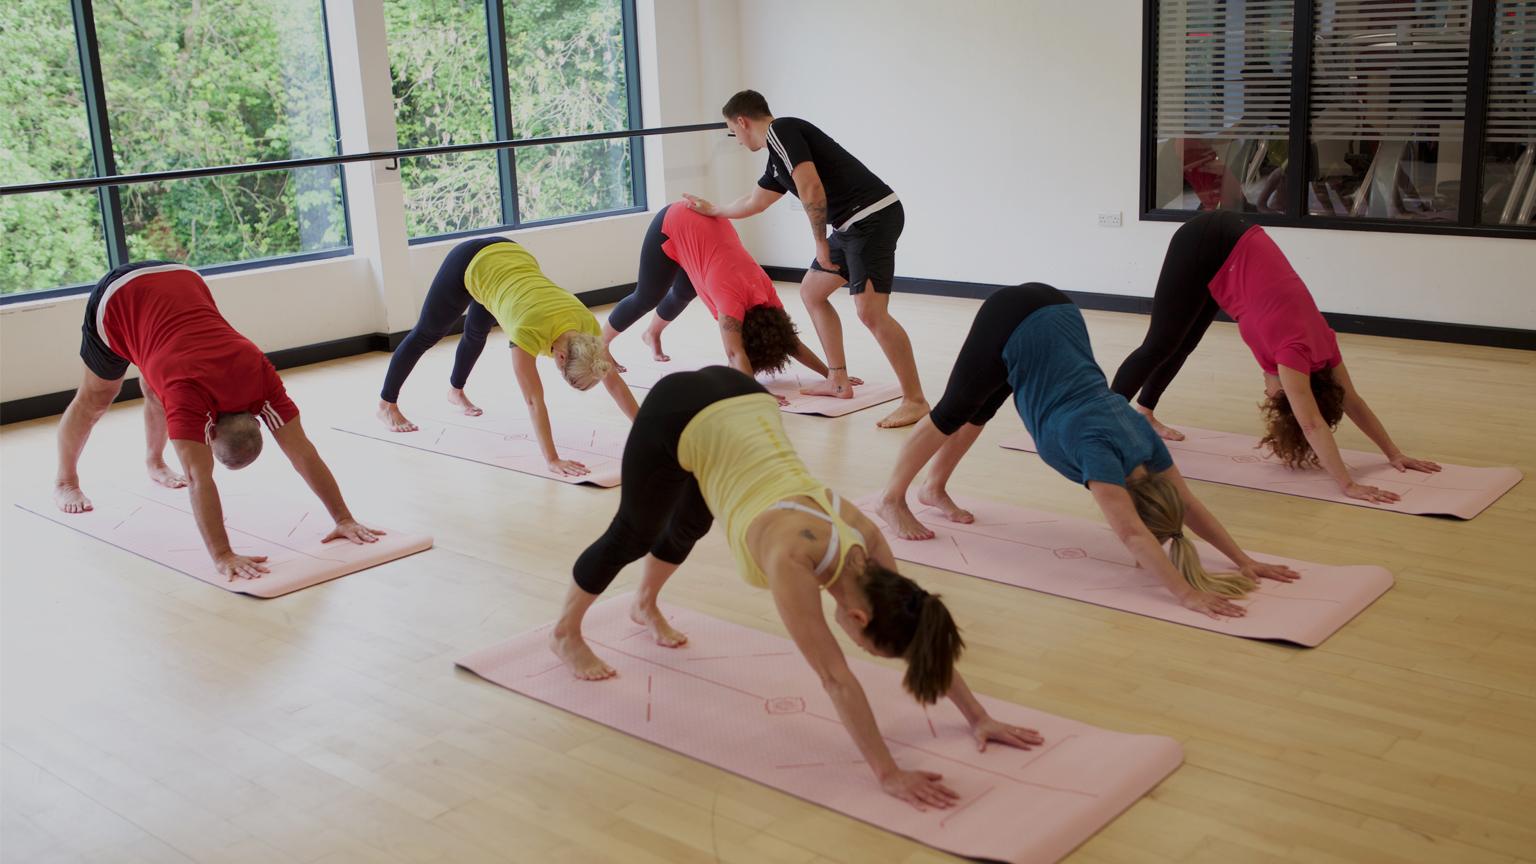 =HFE yoga instructor teaching downward-facing dog